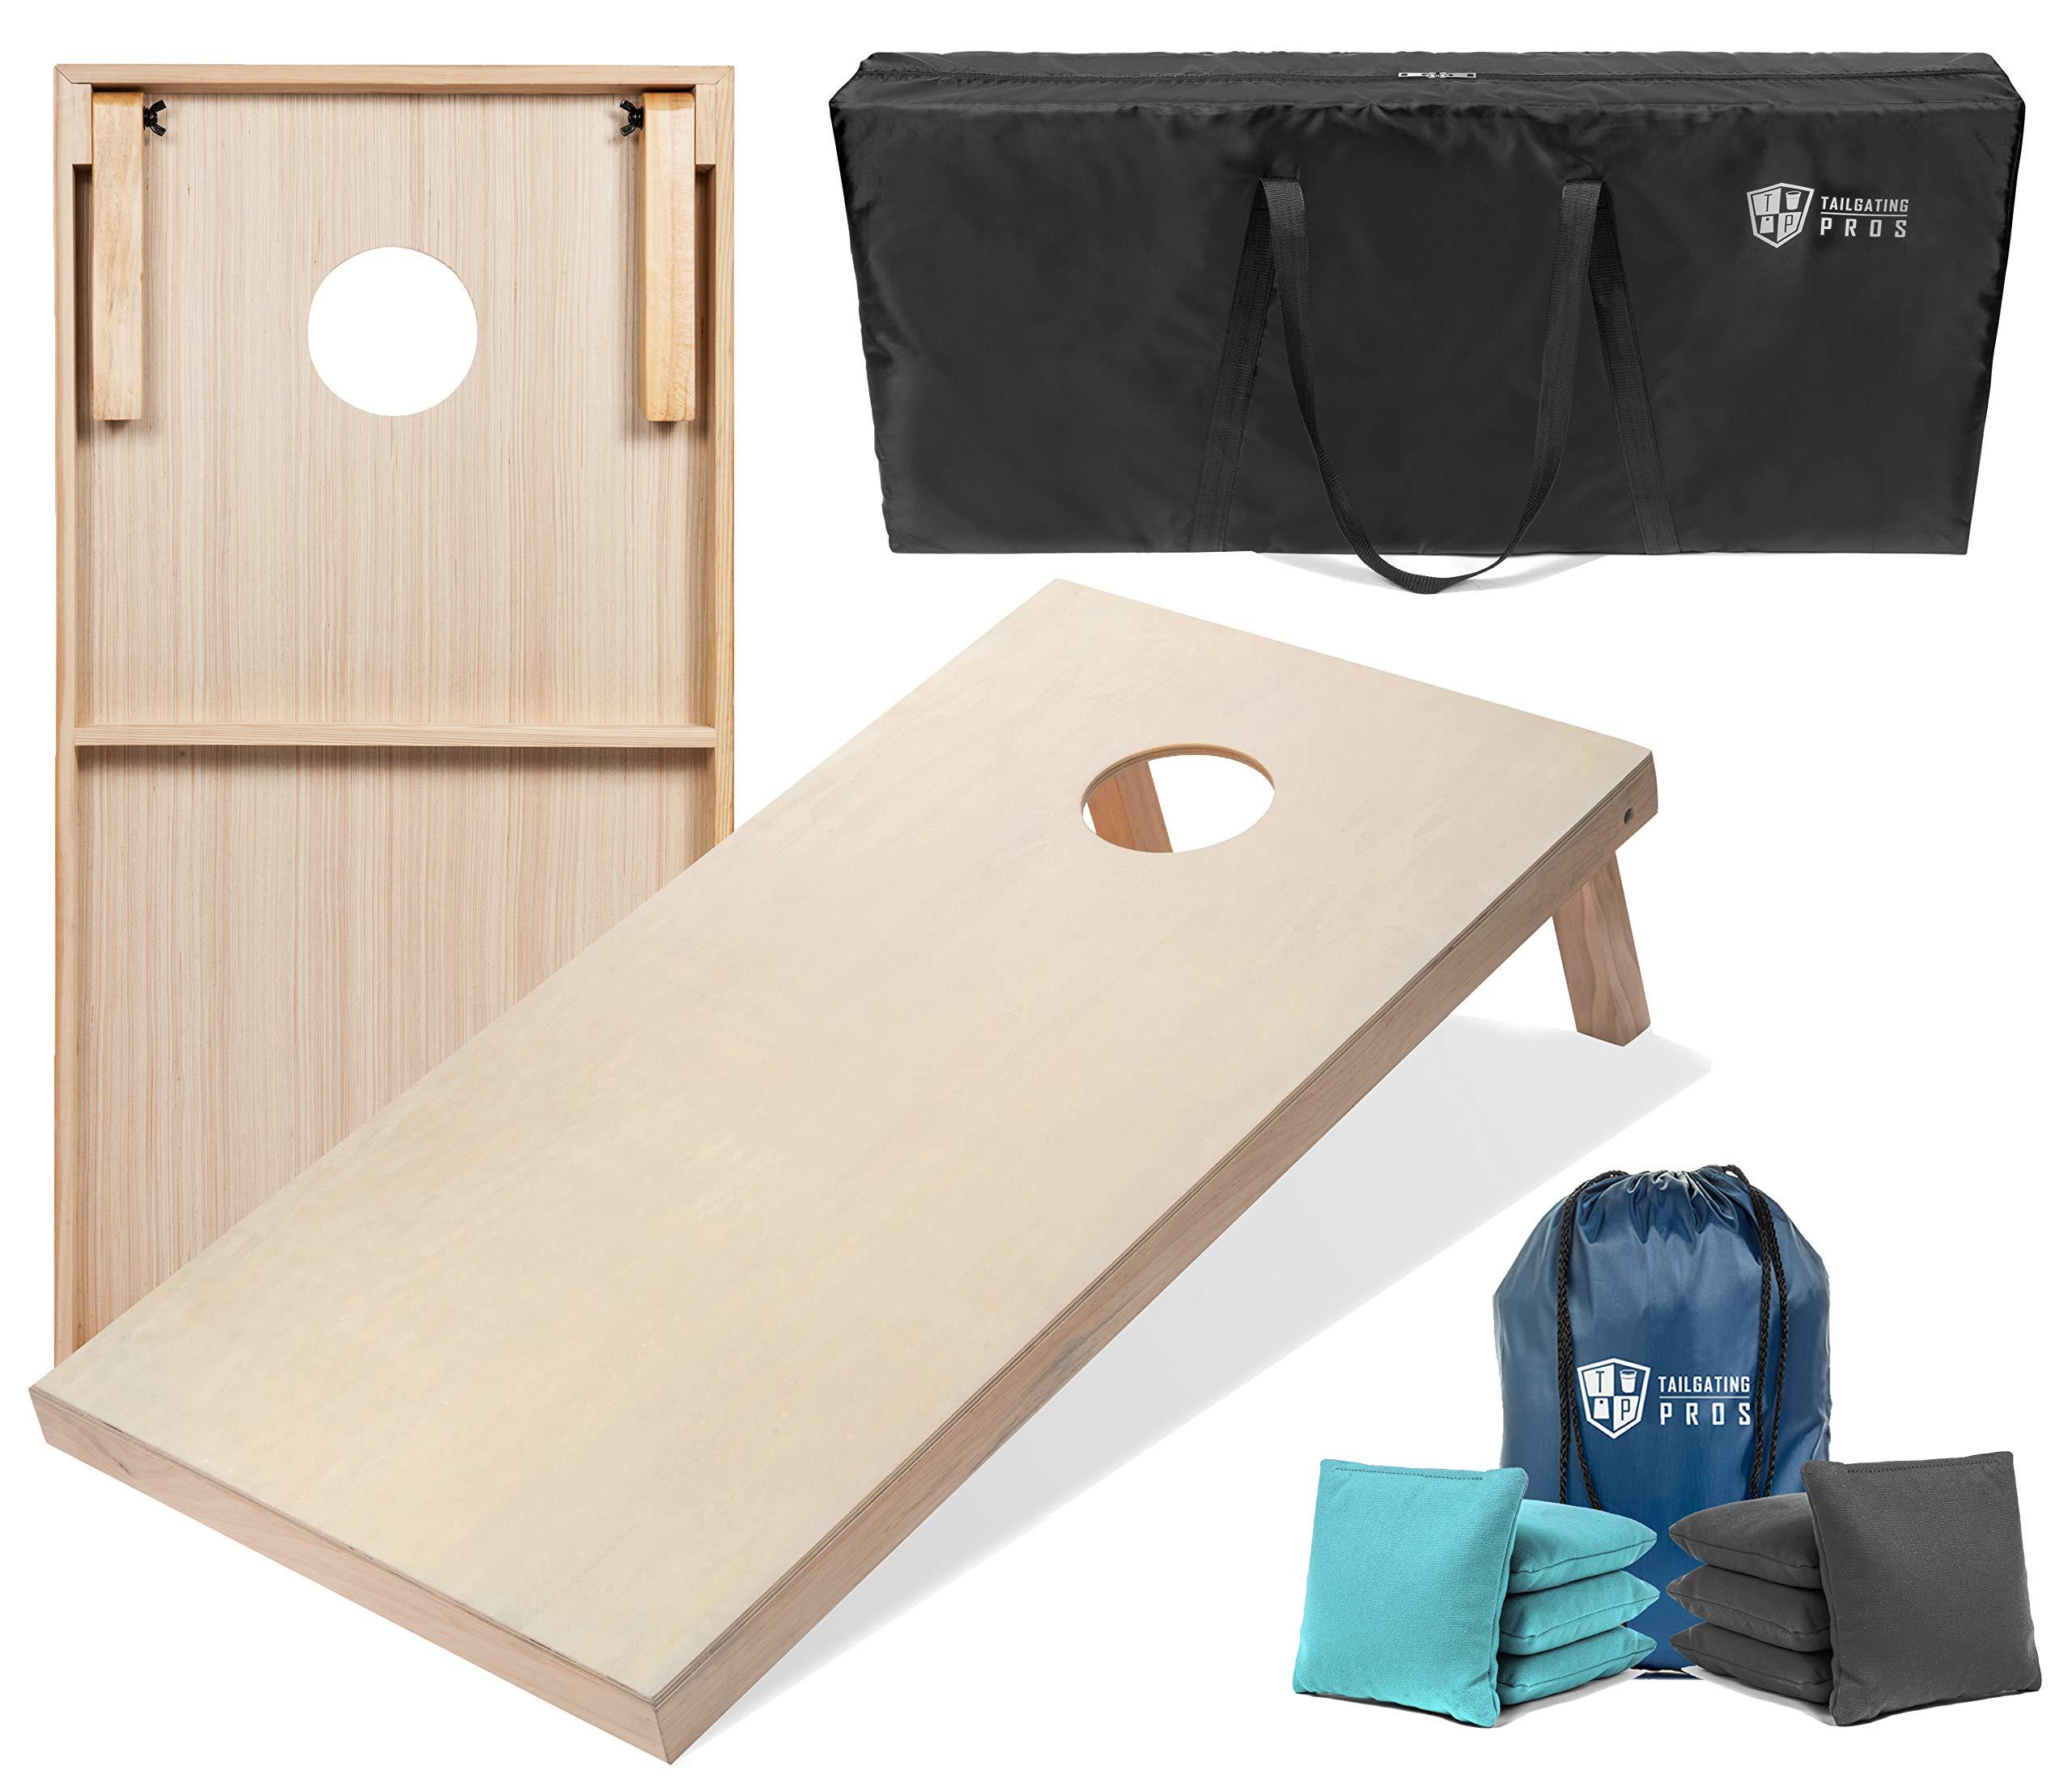 Tailgating Pros Cornhole Boards